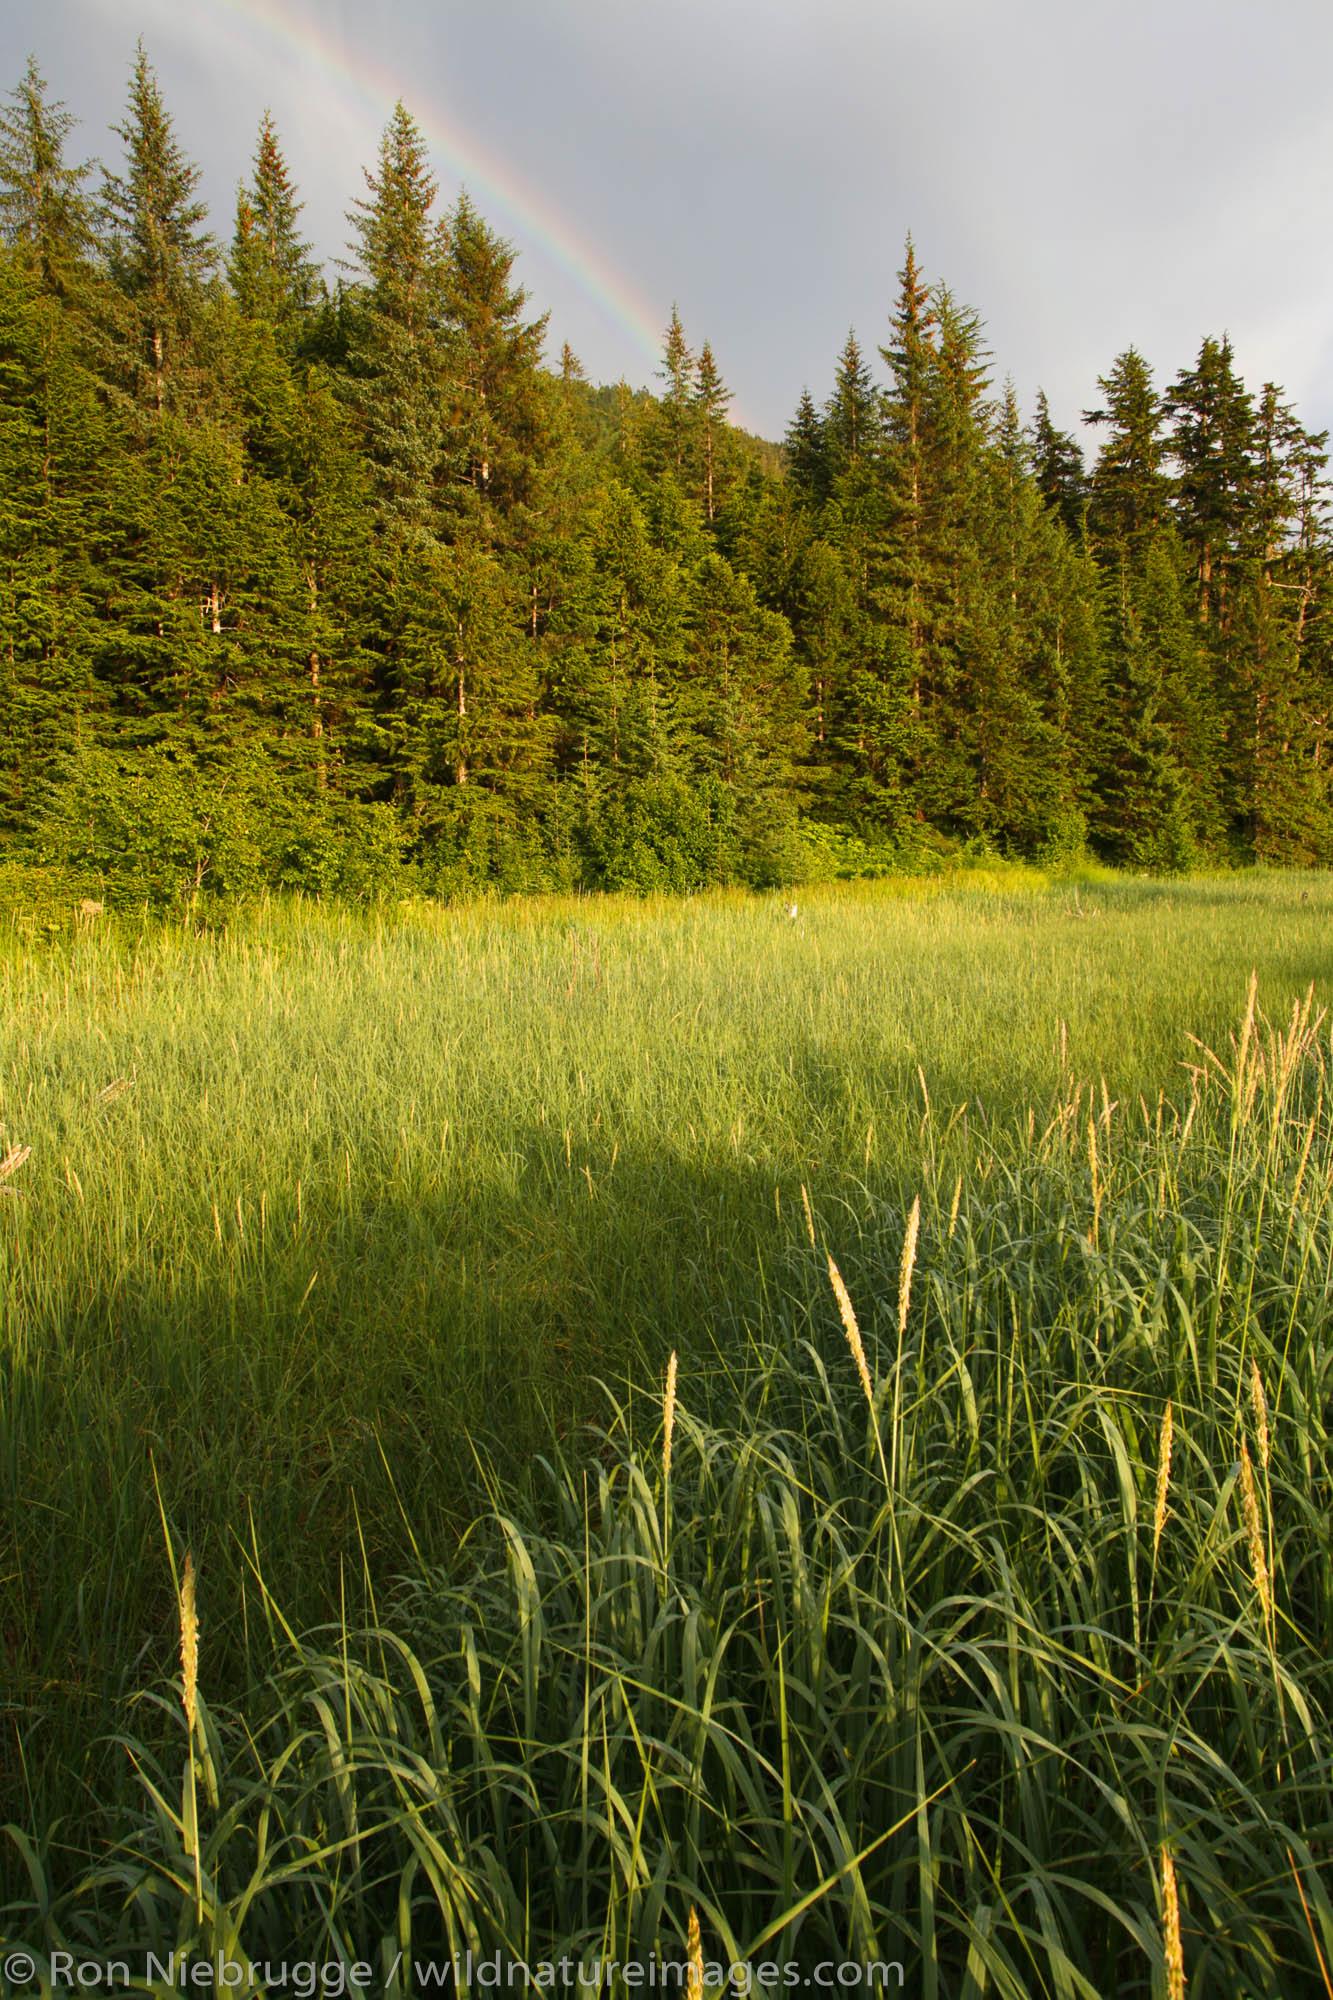 A rainbow, Barry Arm, Prince William Sound, Chugach National Forest, Alaska.